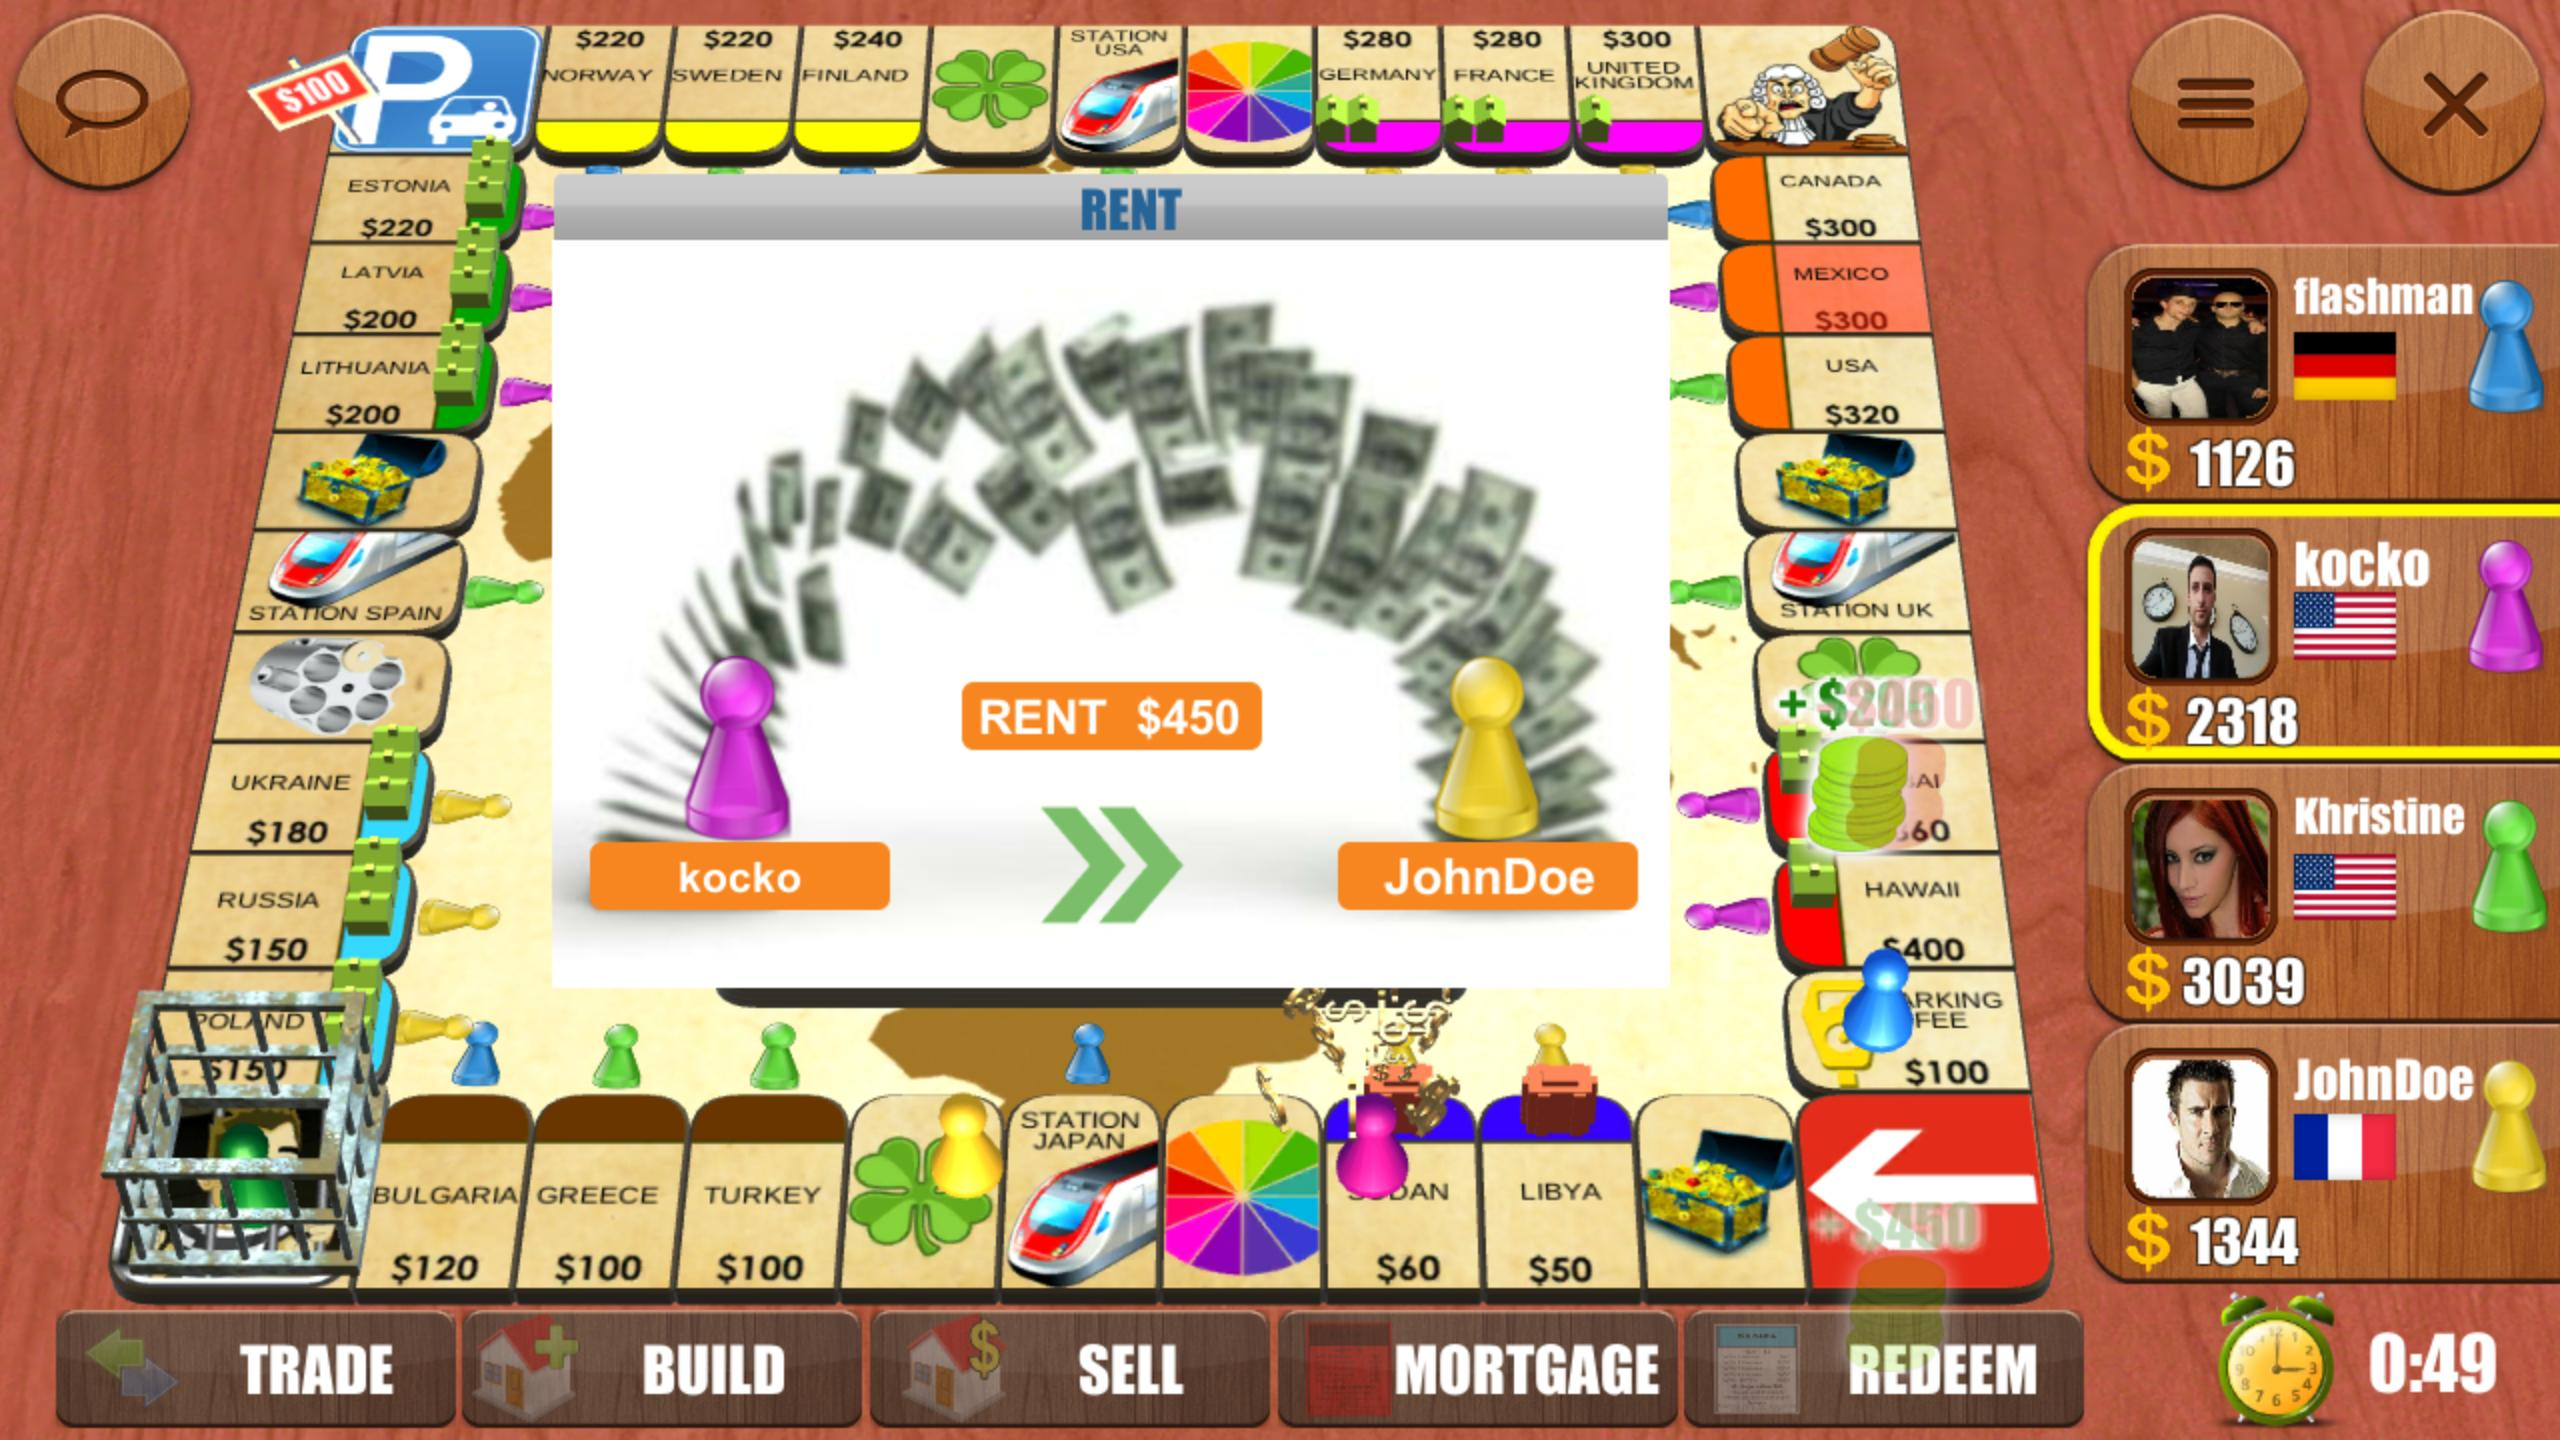 Rento Dice Board Game Online 5.1.9 Screenshot 18